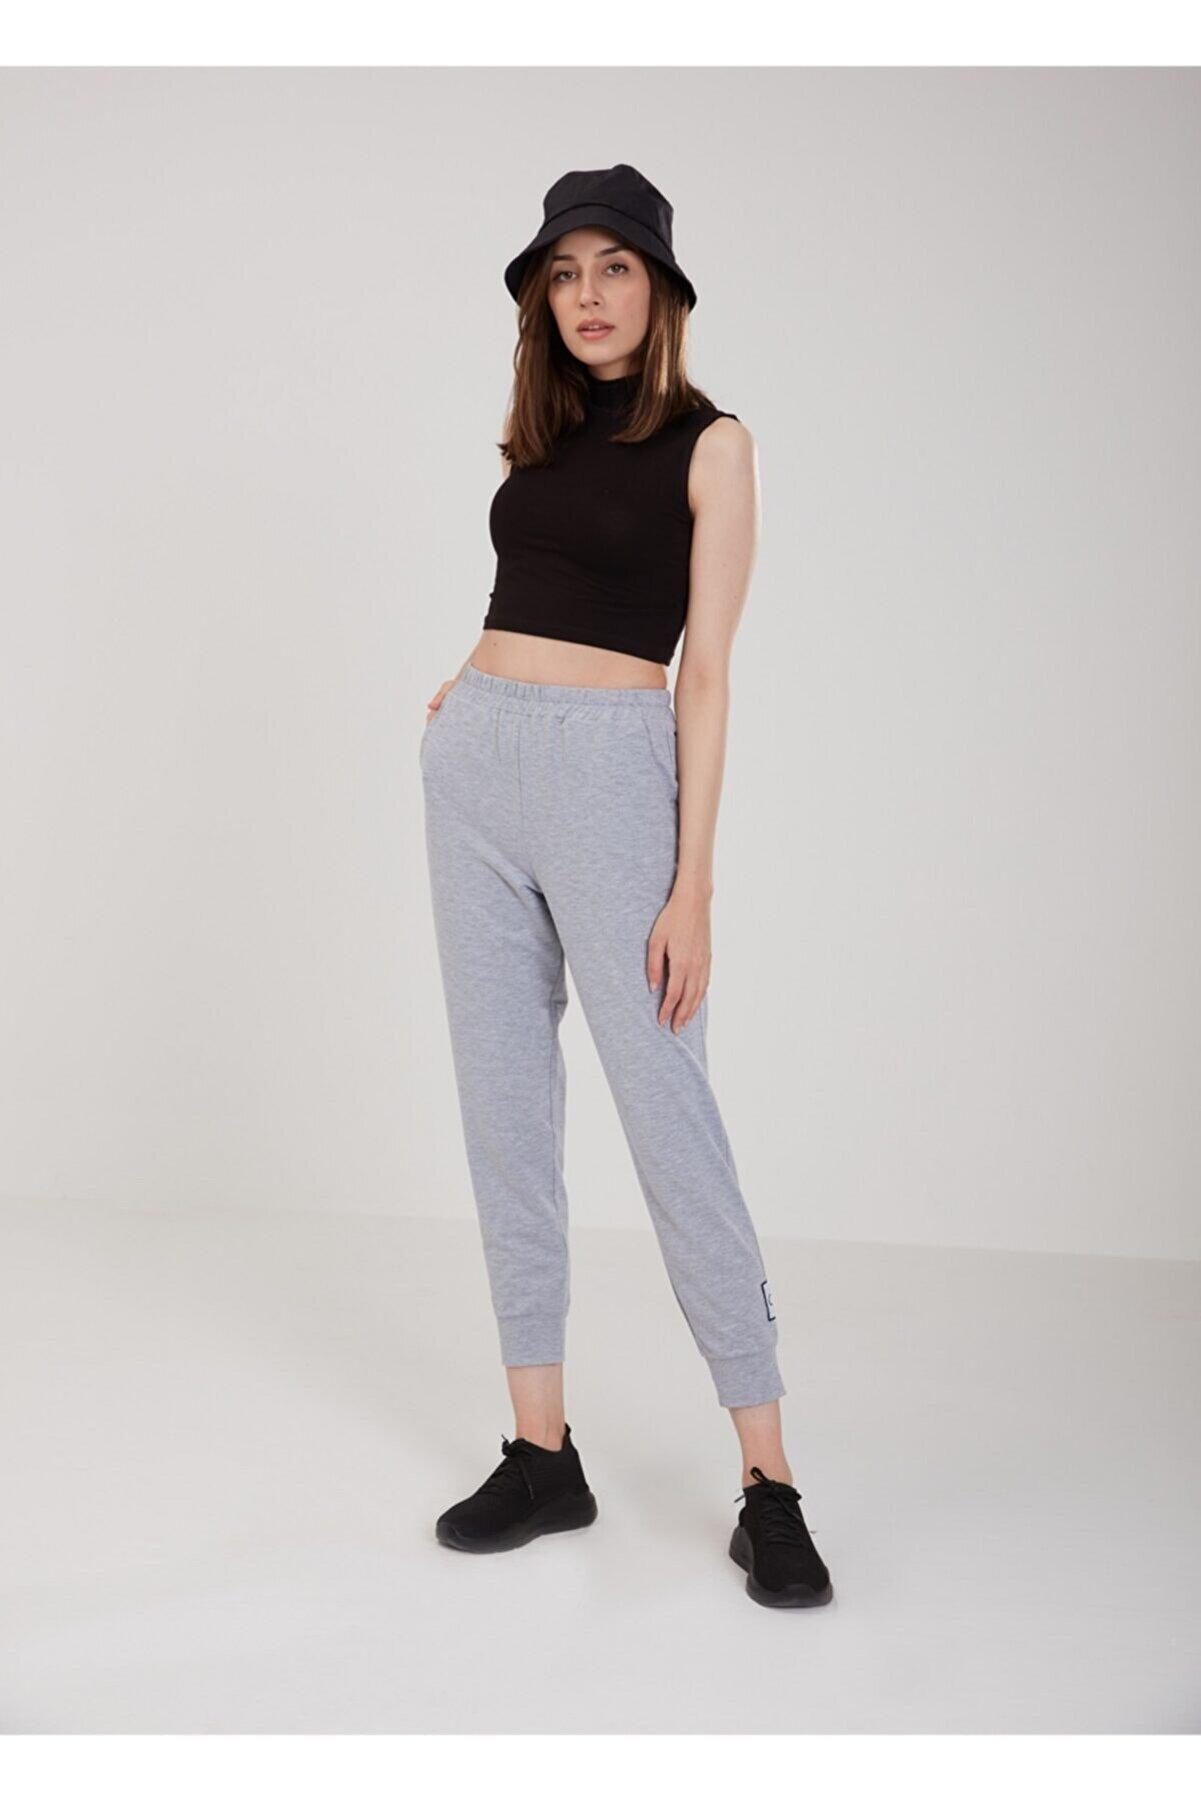 oia Kadın Gri Pamuklu Eşofman Altı Pantolon